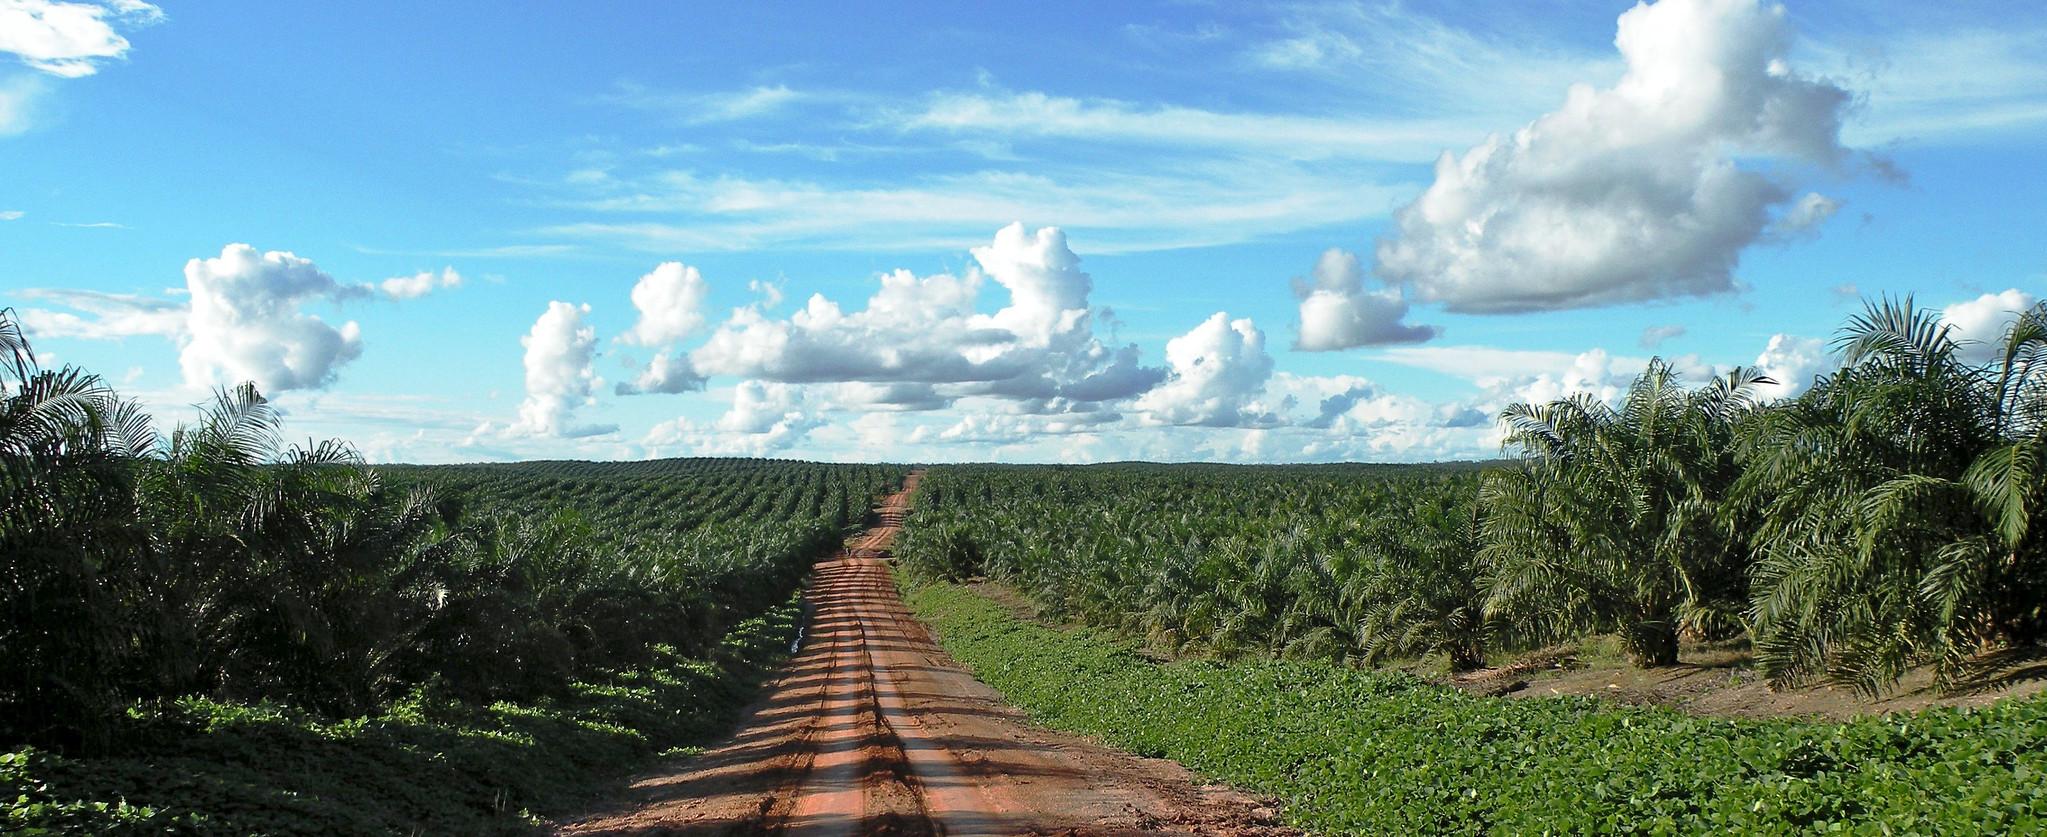 Plantation landscape